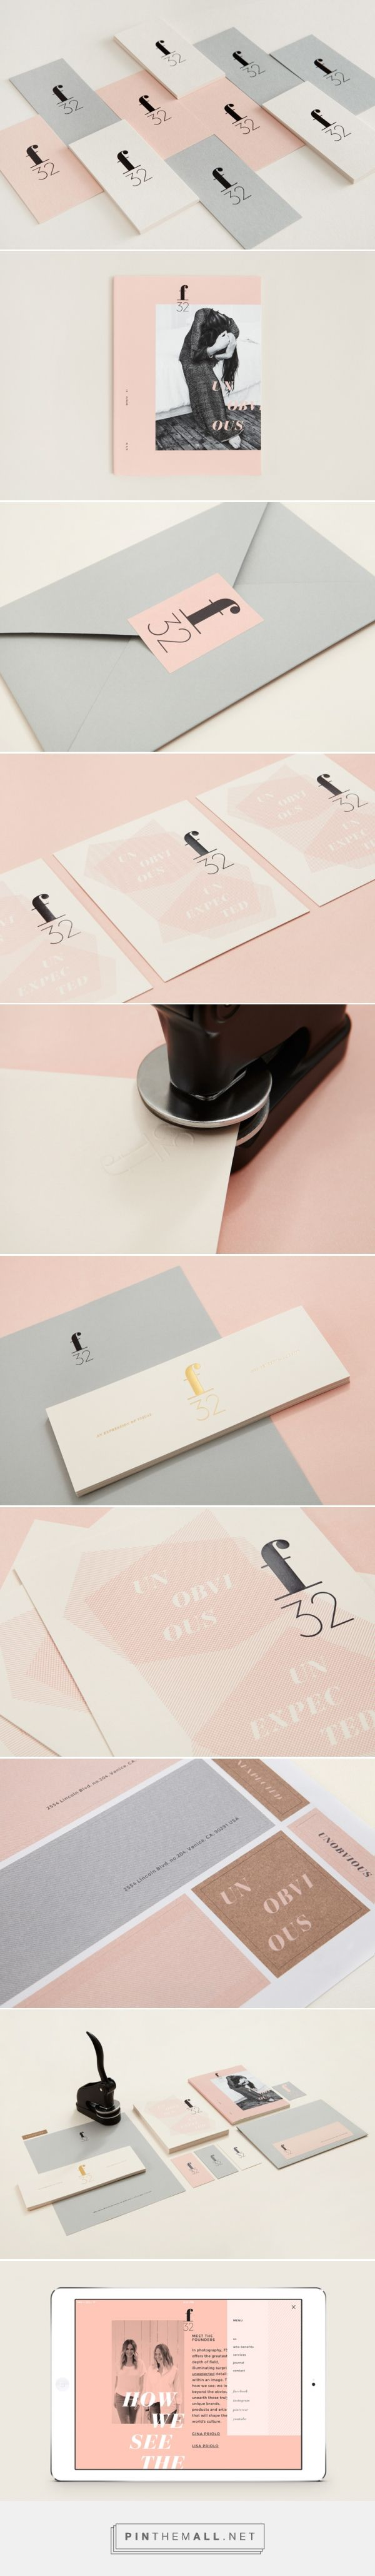 branding corporate identity stationary minimalistic graphic design sticker business card letterhead magazine cover website..